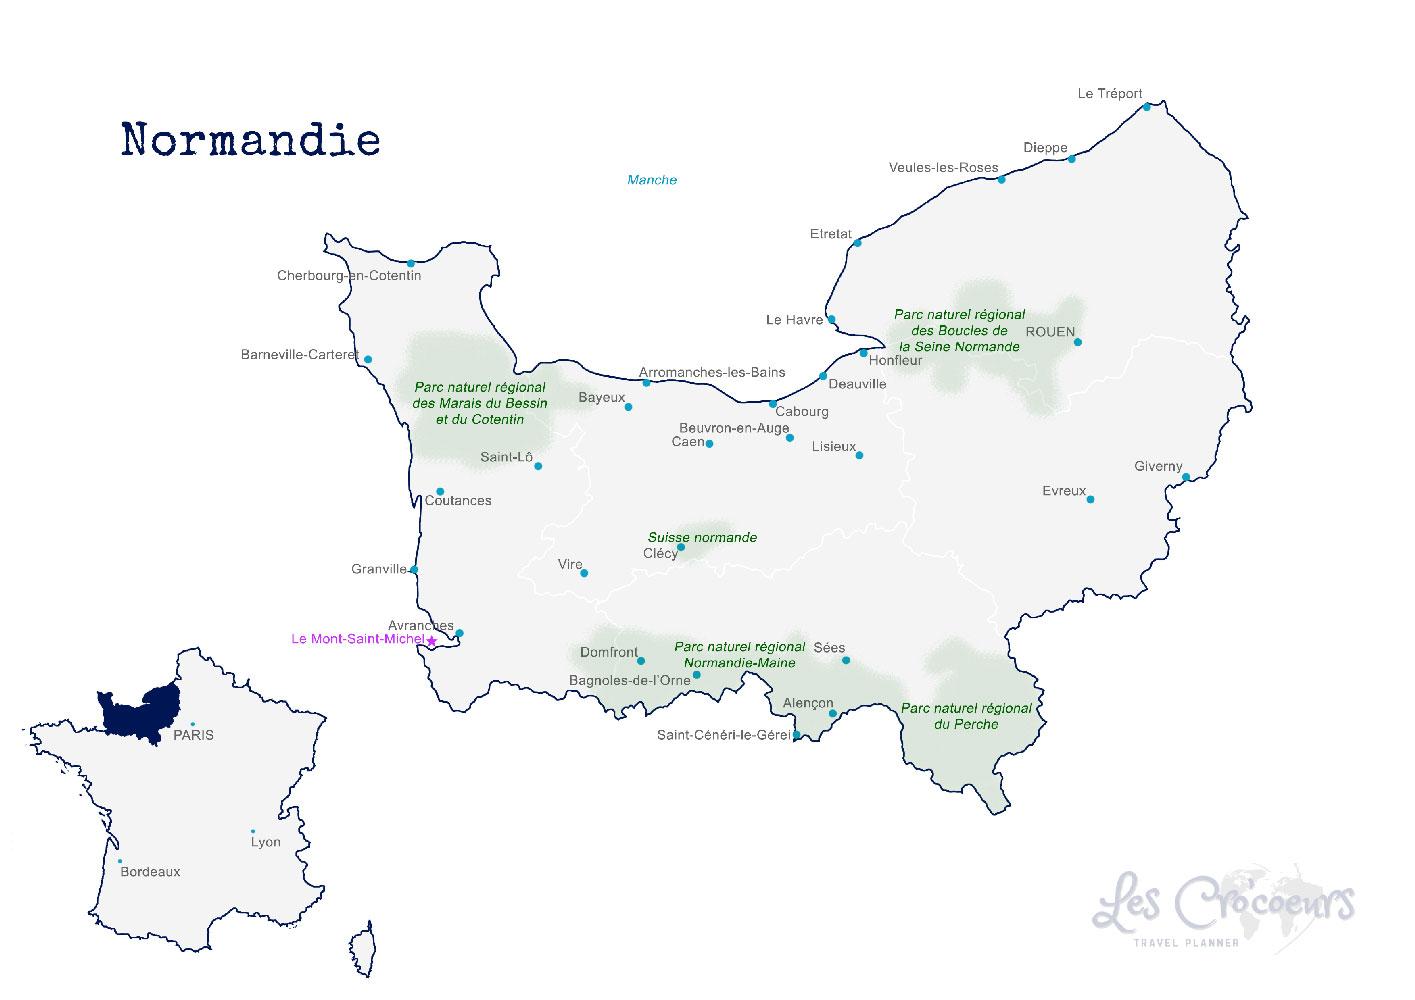 Carte Normandie - les Cro'coeurs Travel Planner & Blog Voyage